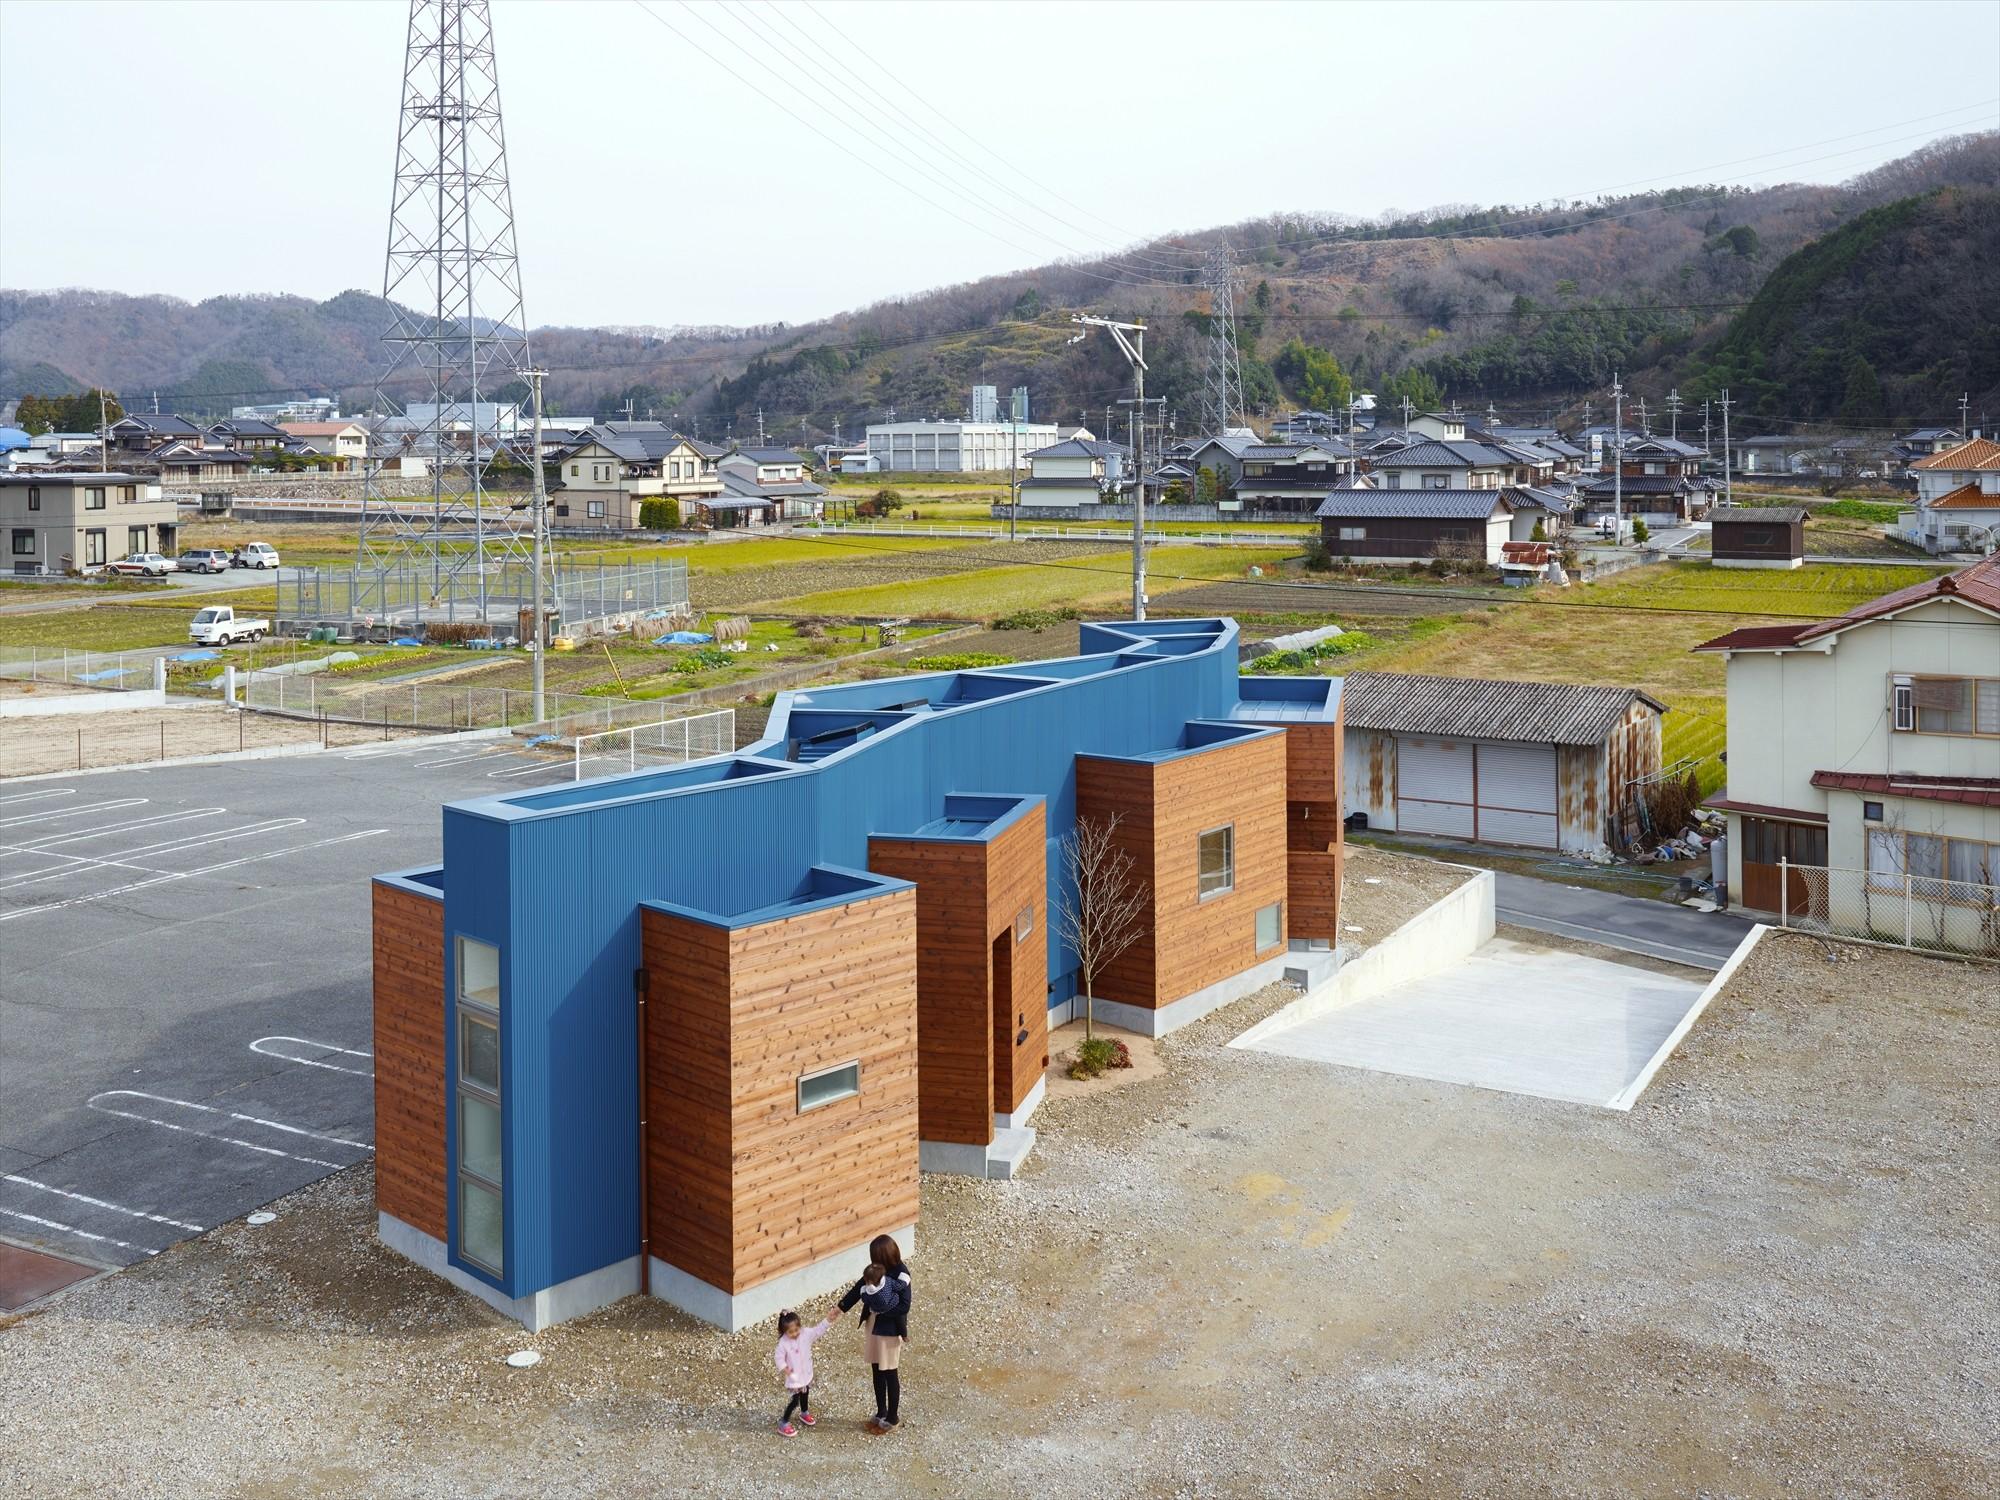 House in Sayo / Fujiwarramuro Architects, © Yano Toshiyuki